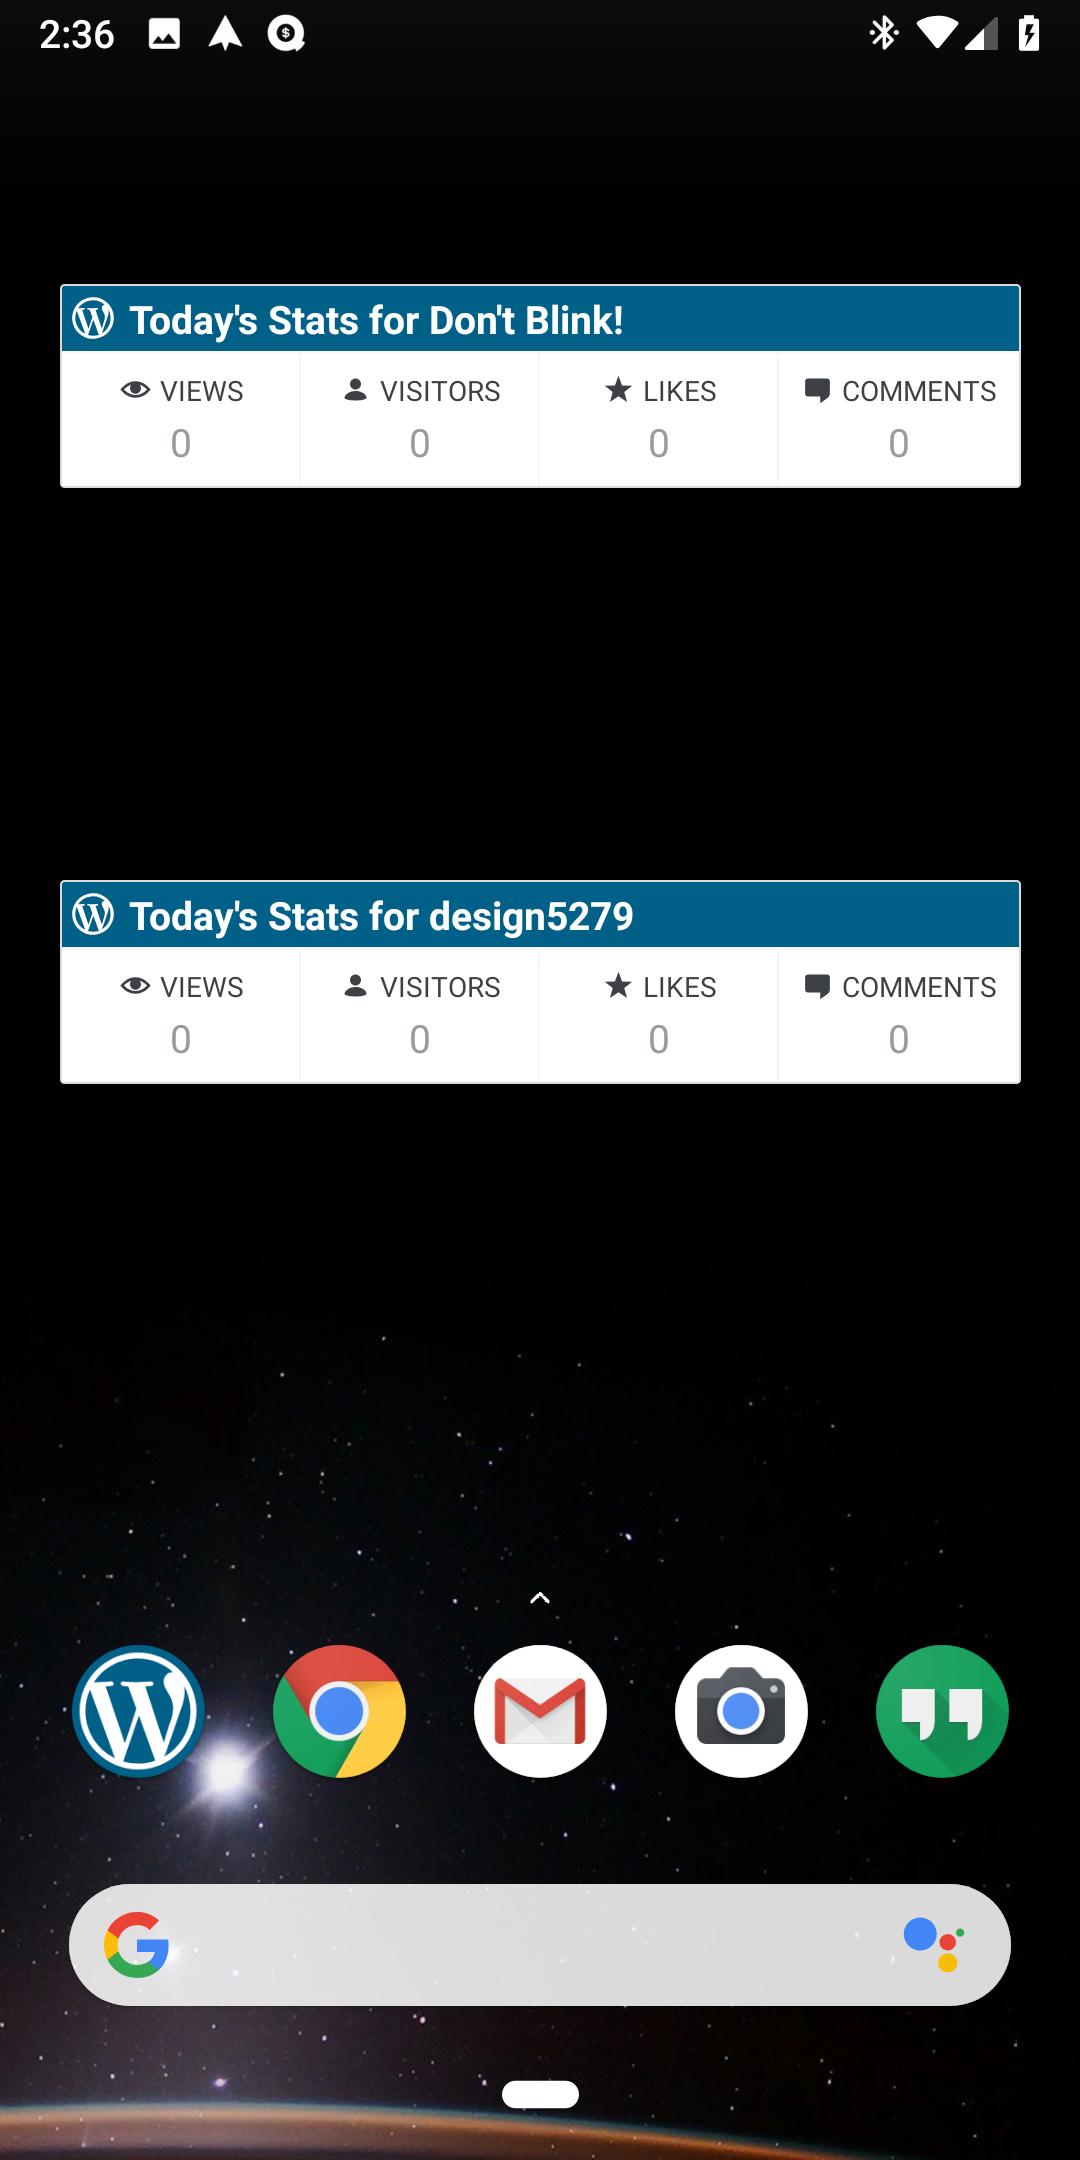 Stats Widget: WordPress Today's Stats widgets load the wrong